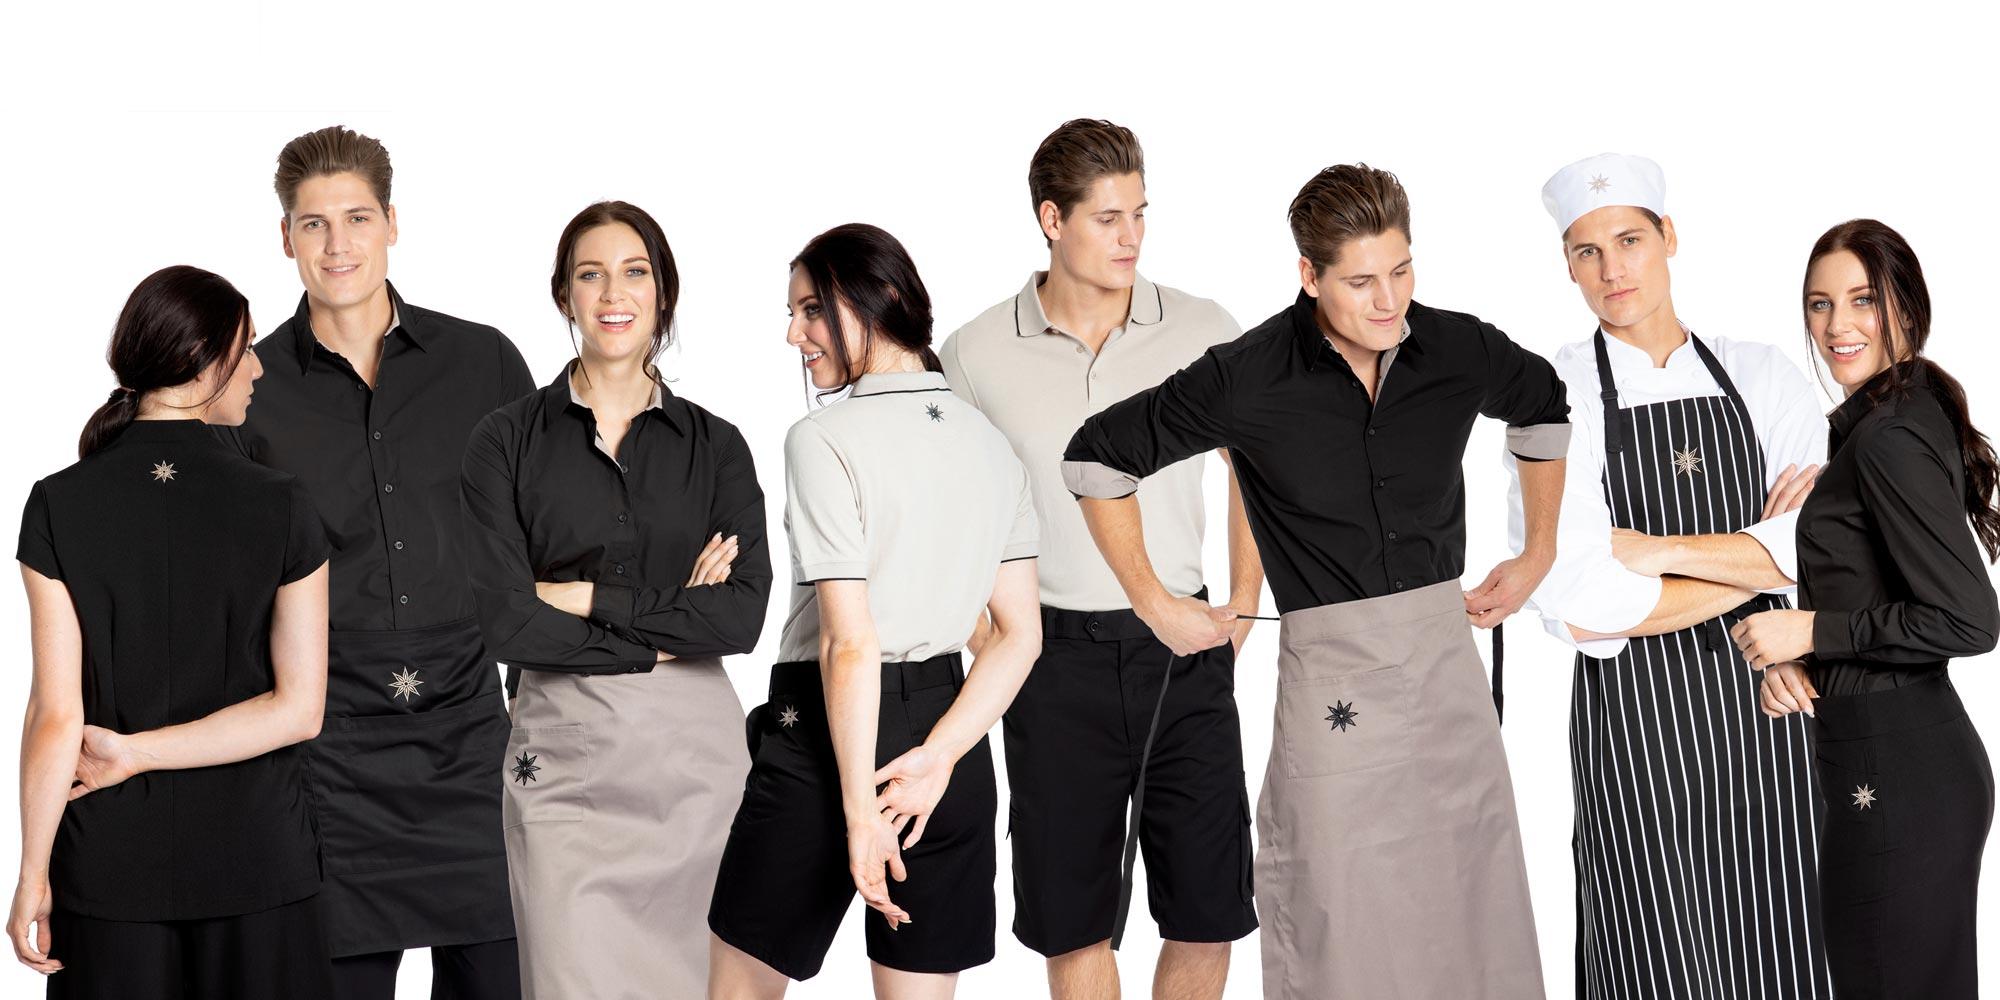 6 Corporate Uniform Trends in 2020/21